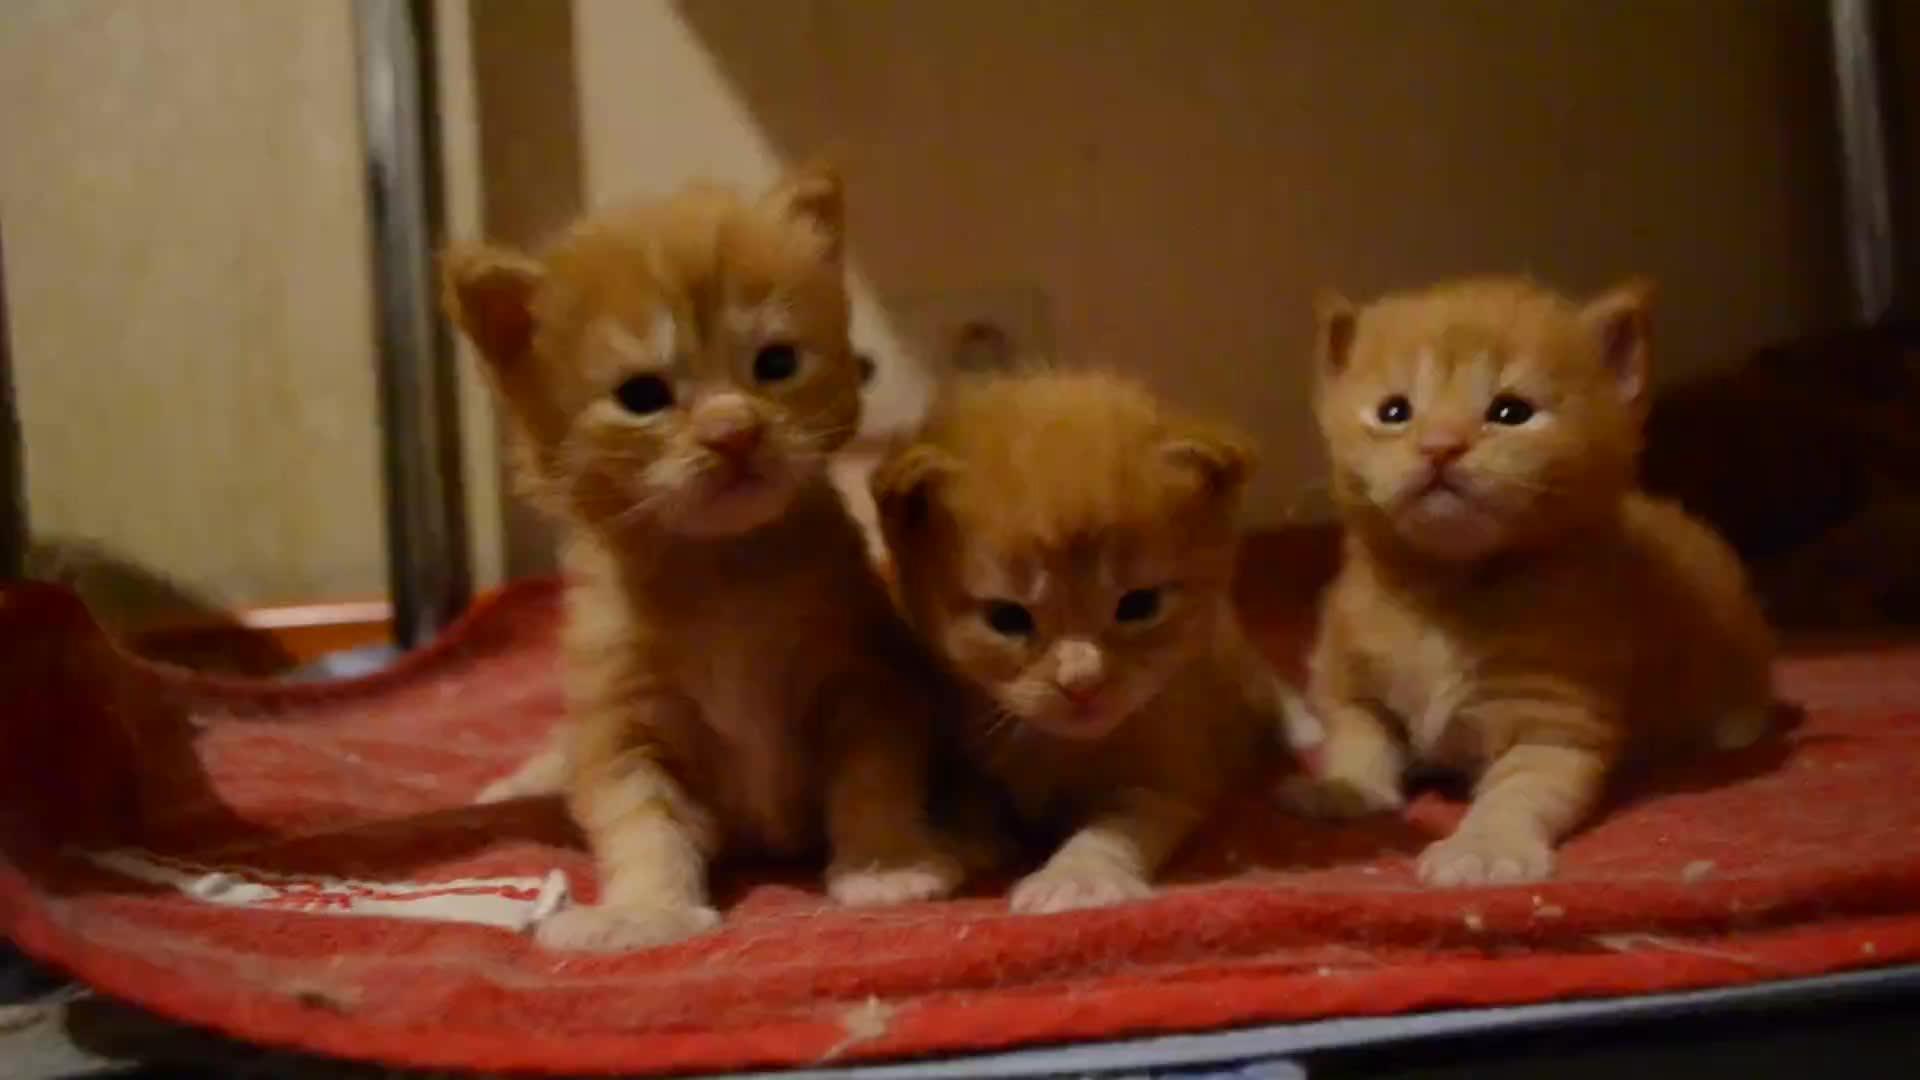 Cute kittens, Cute kittens GIFs